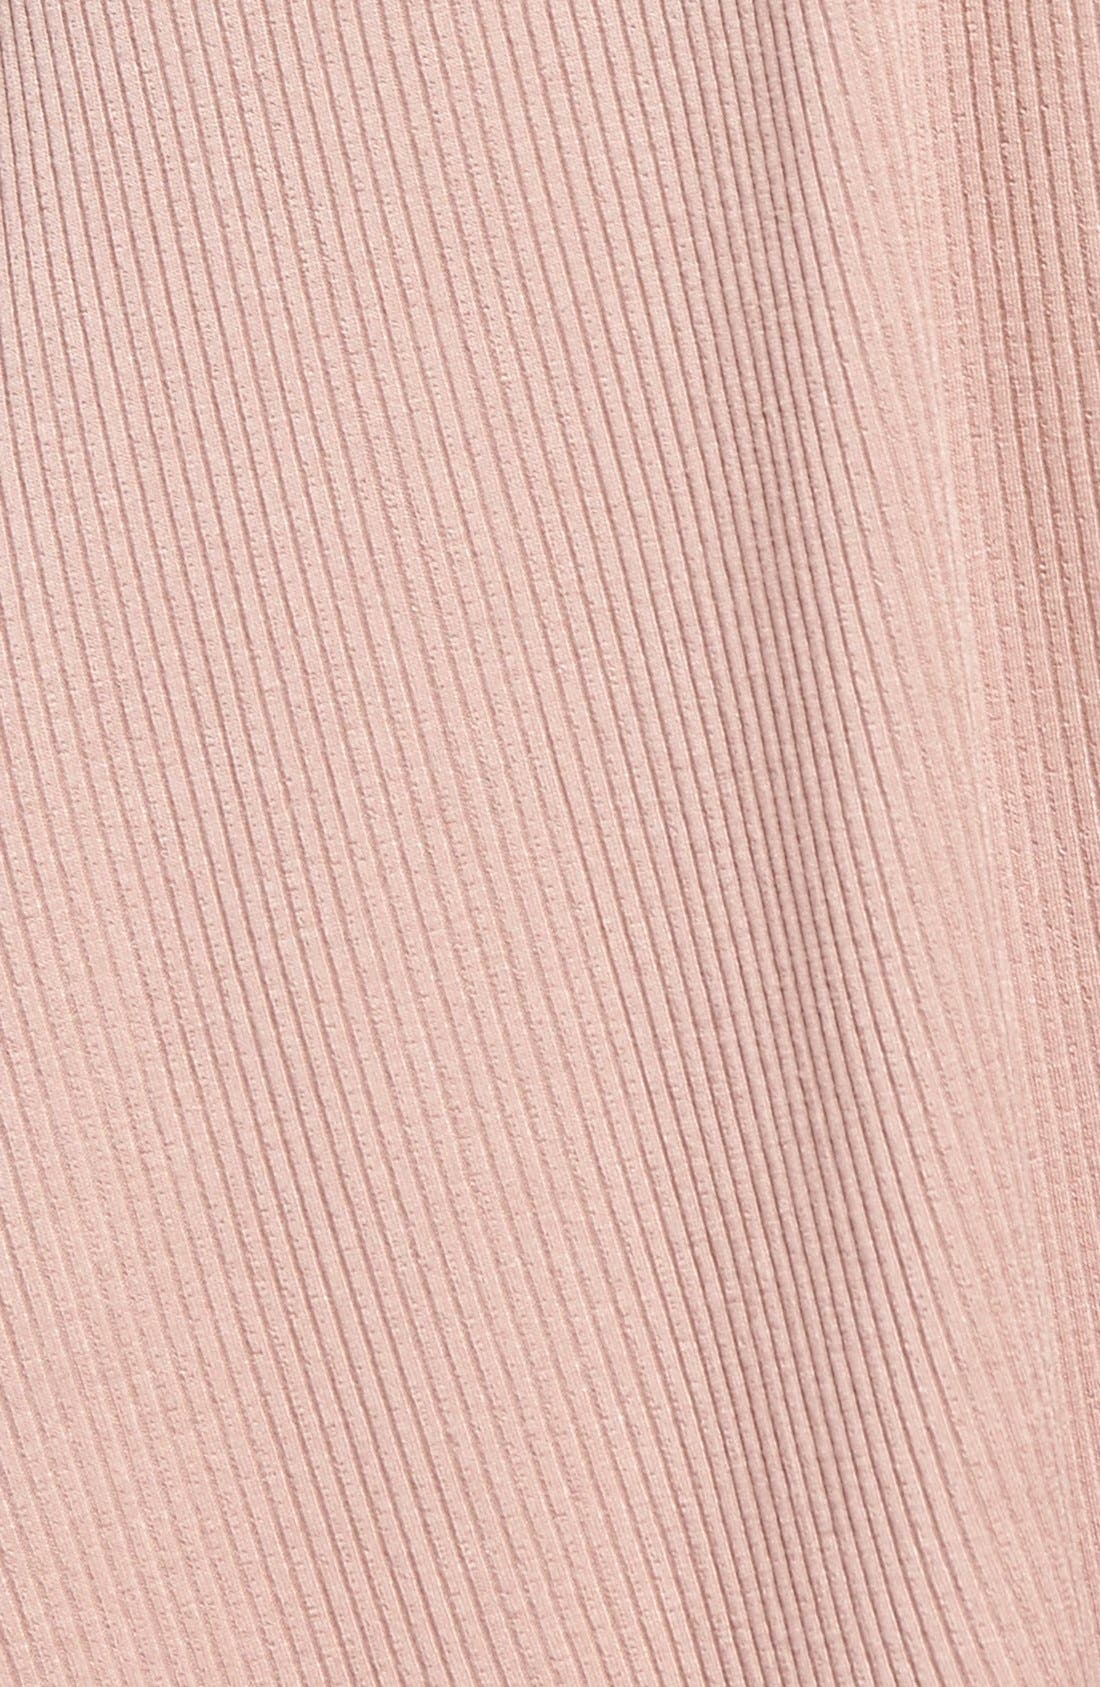 Rib Knit Lace-Up Swing Dress,                             Alternate thumbnail 11, color,